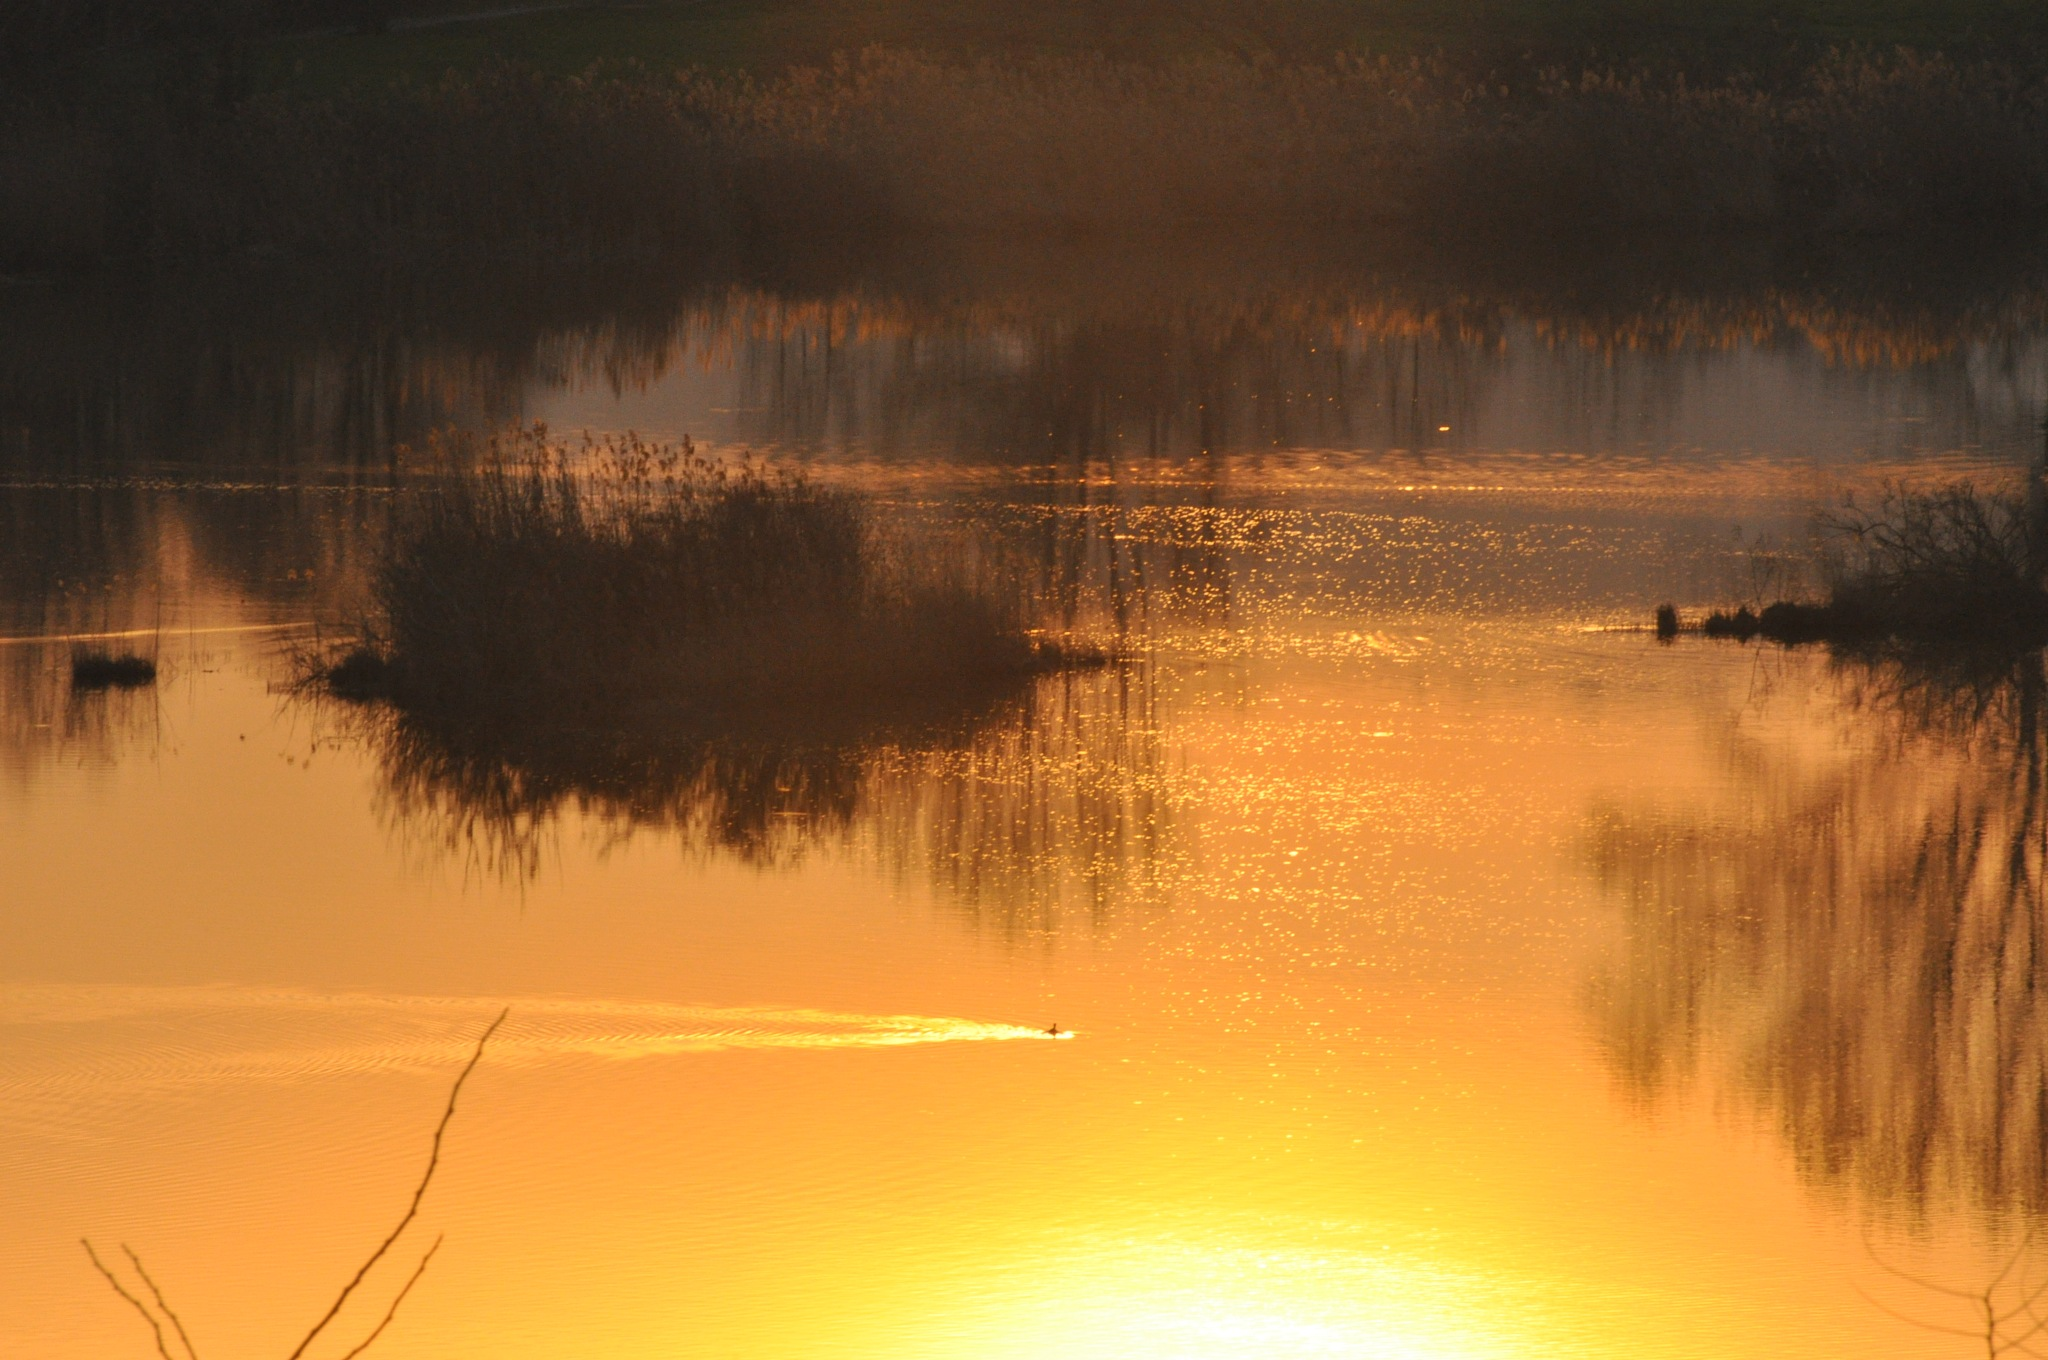 Torbiere del lago d'Iseo by filippo.true